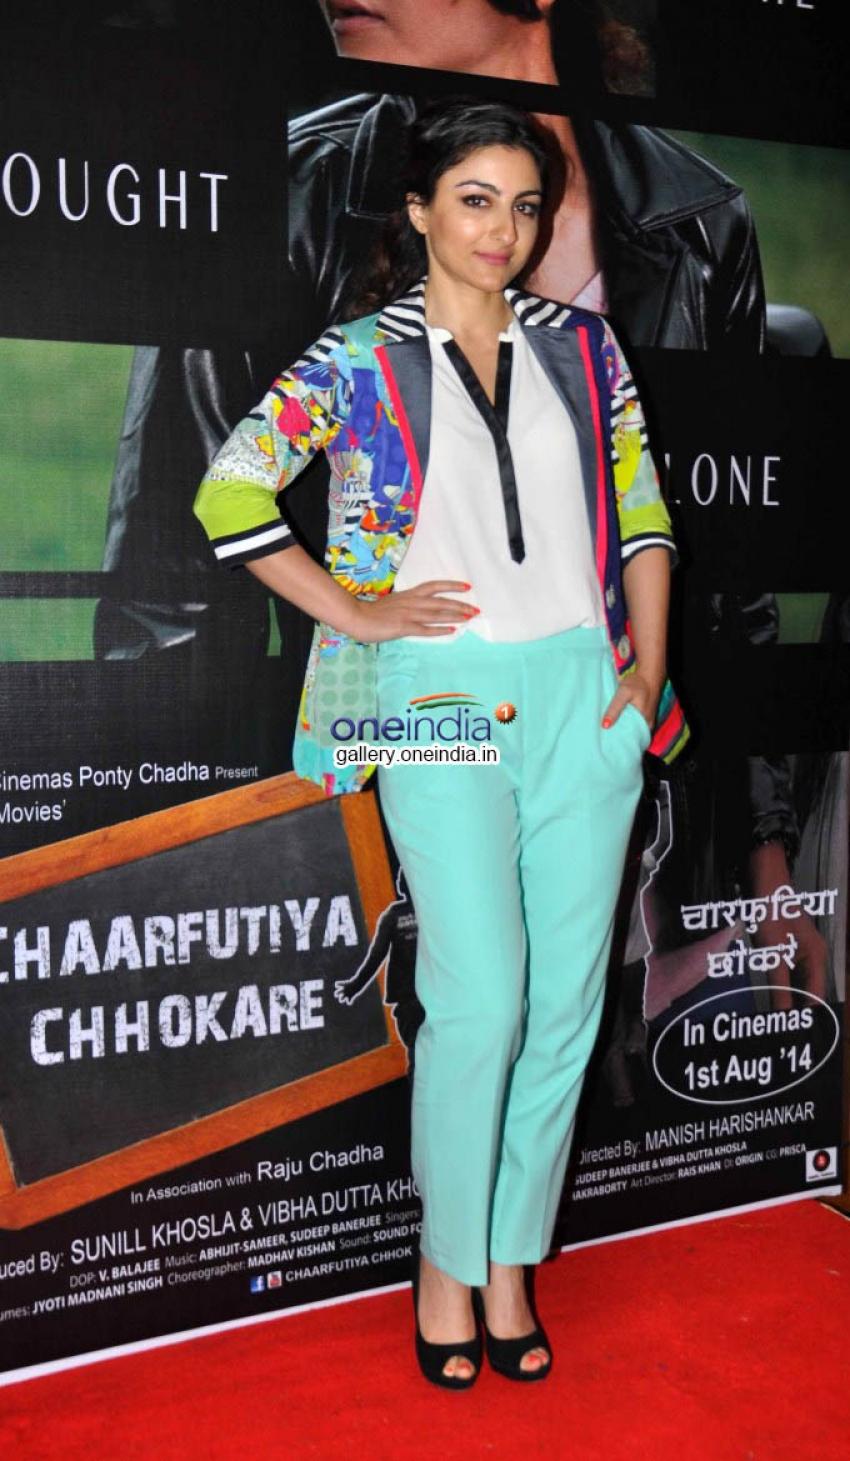 Promotion launch of  Soha Ali Khan's Chaarfutiya Chhokare Photos